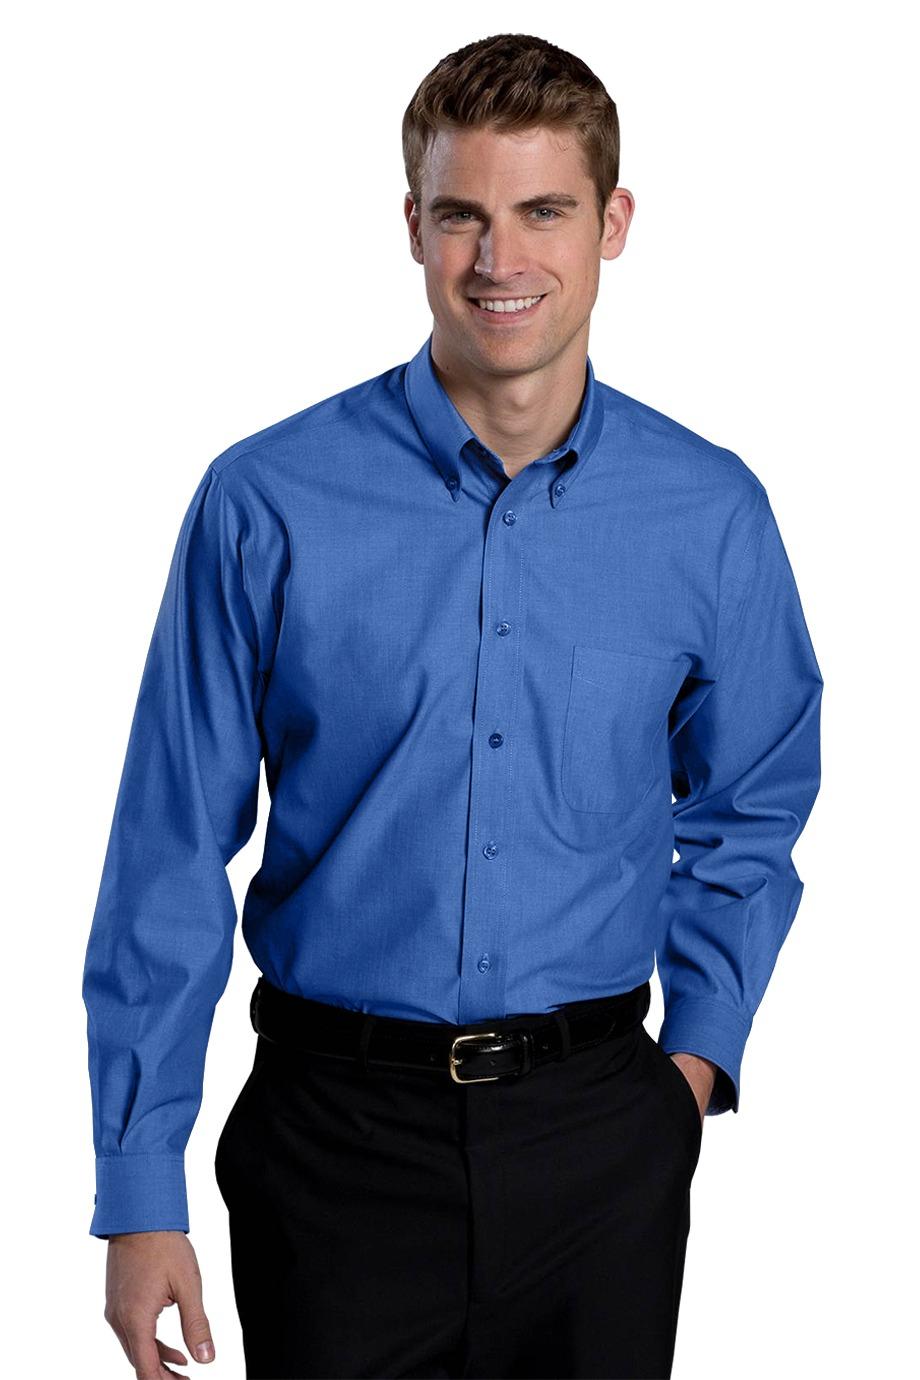 Mens button down dress shirts south park t shirts for Men s no iron dress shirts